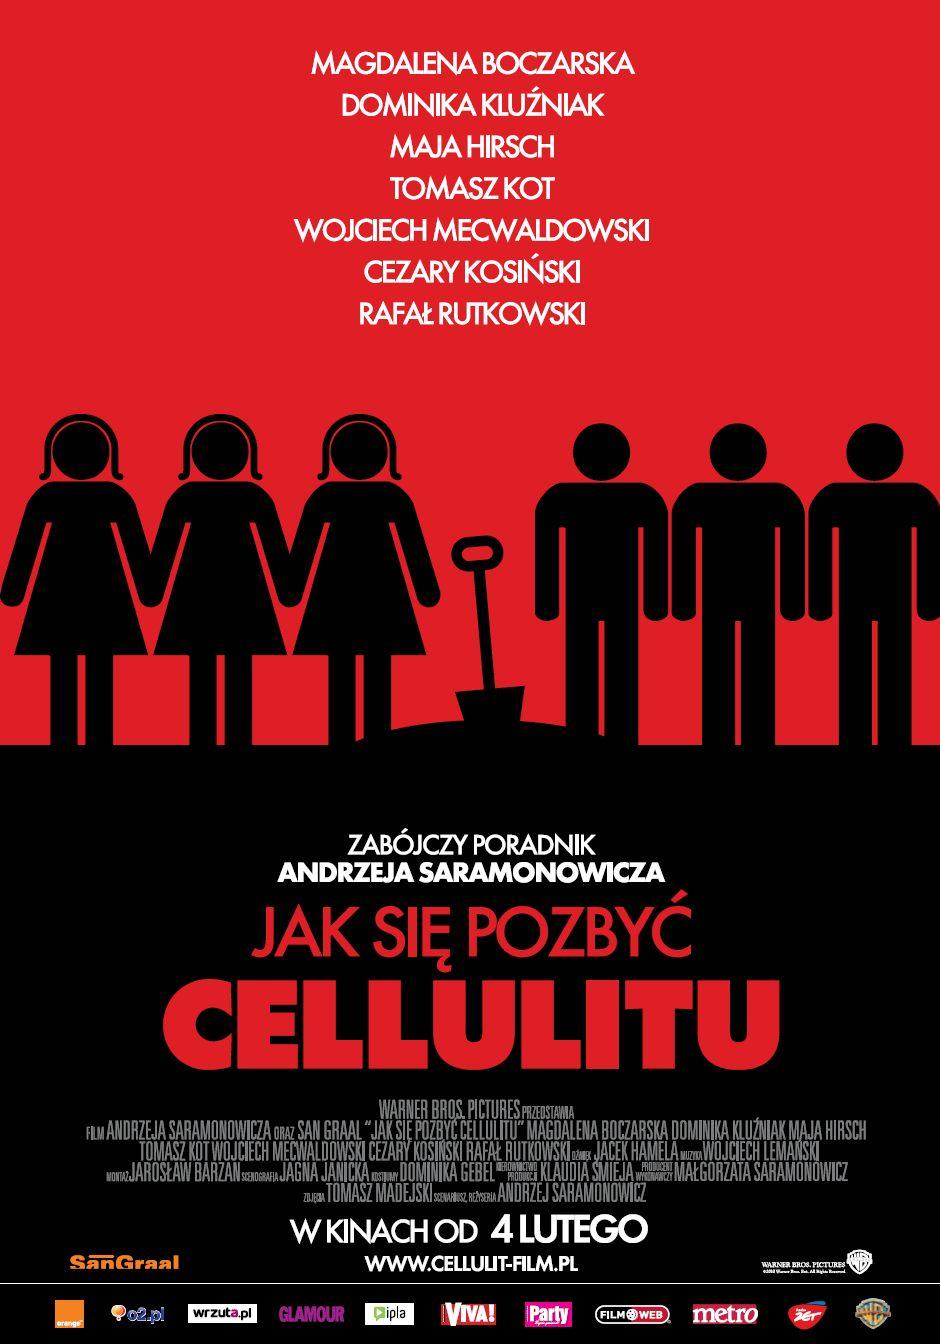 How To Get Rid Of Cellulite / Jak sie pozbyc cellulitu (2011)